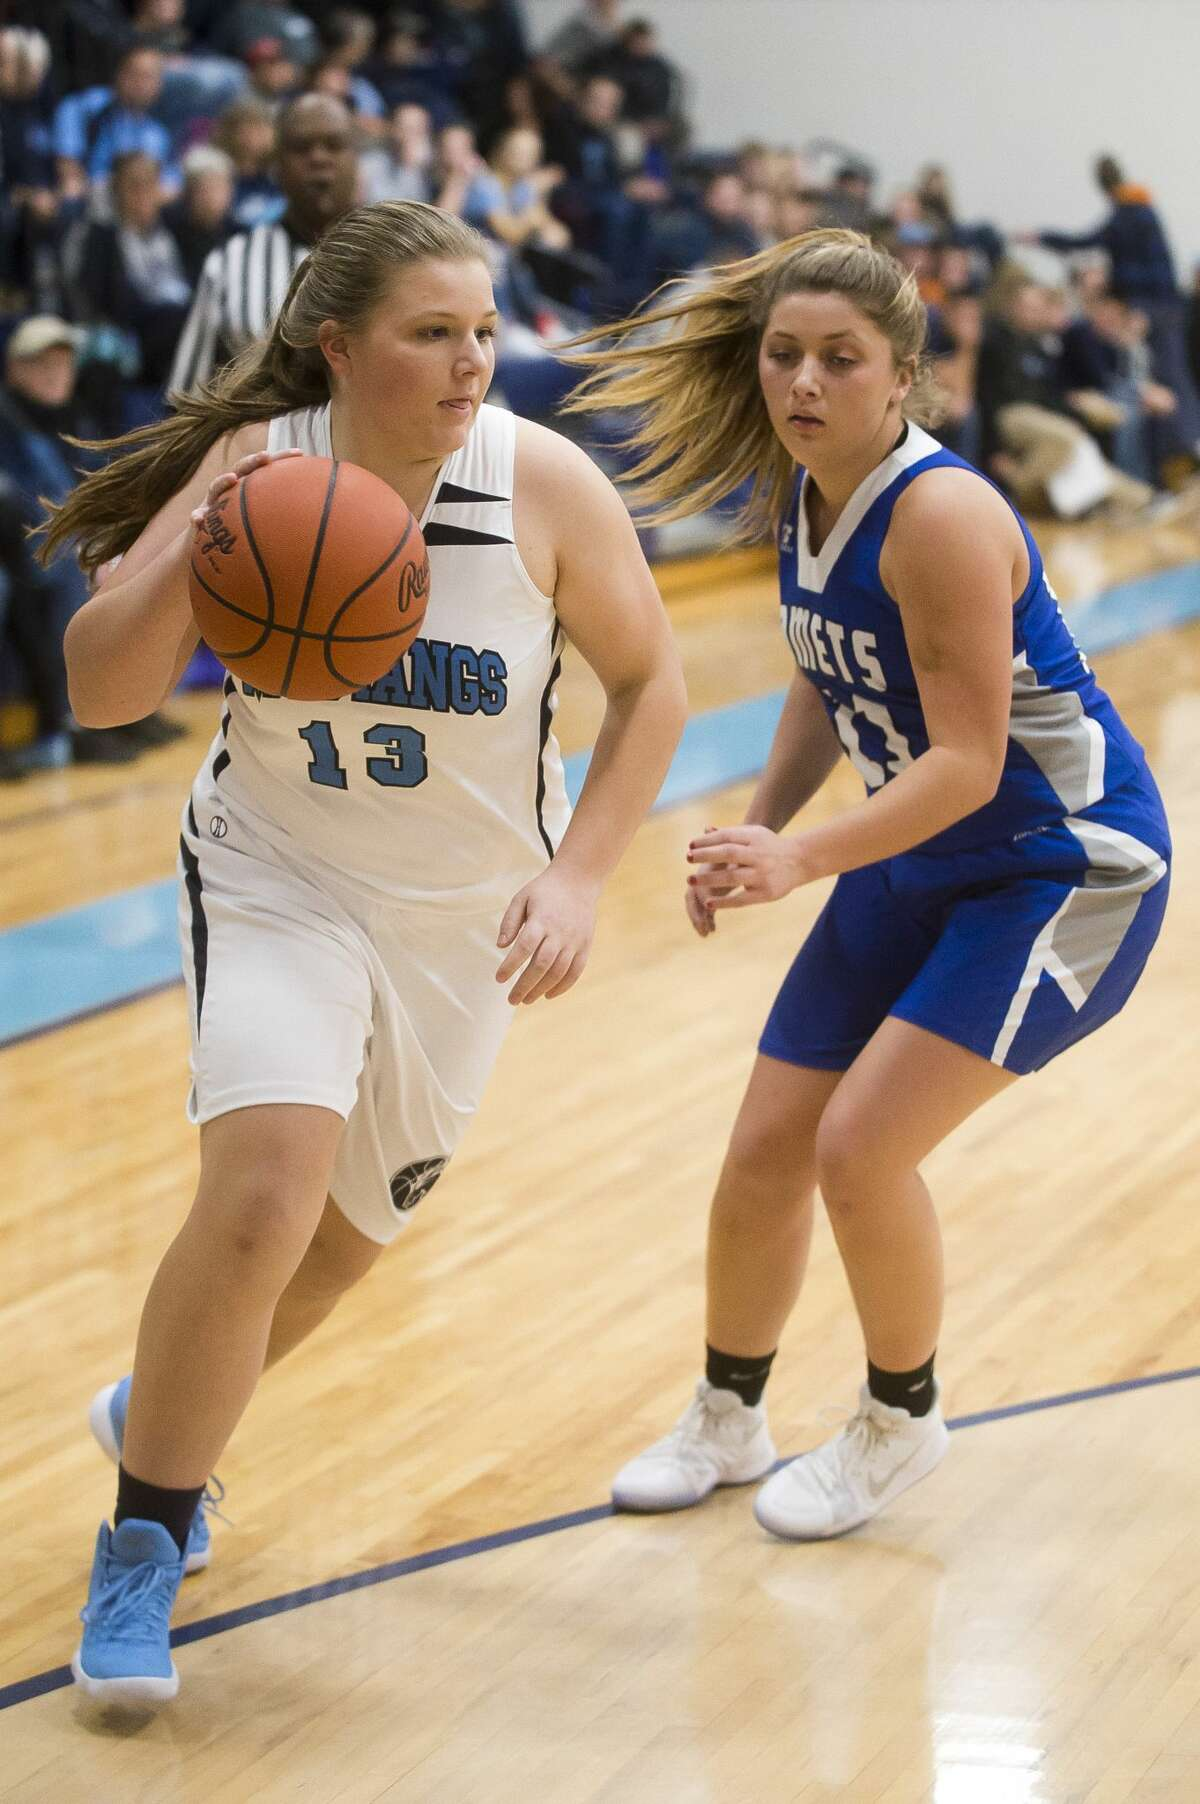 Meridian junior Karley Kent dribbles toward the basket during a game against Coleman on Monday, Dec. 18, 2017 at Meridian Early College High School. (Katy Kildee/kkildee@mdn.net)